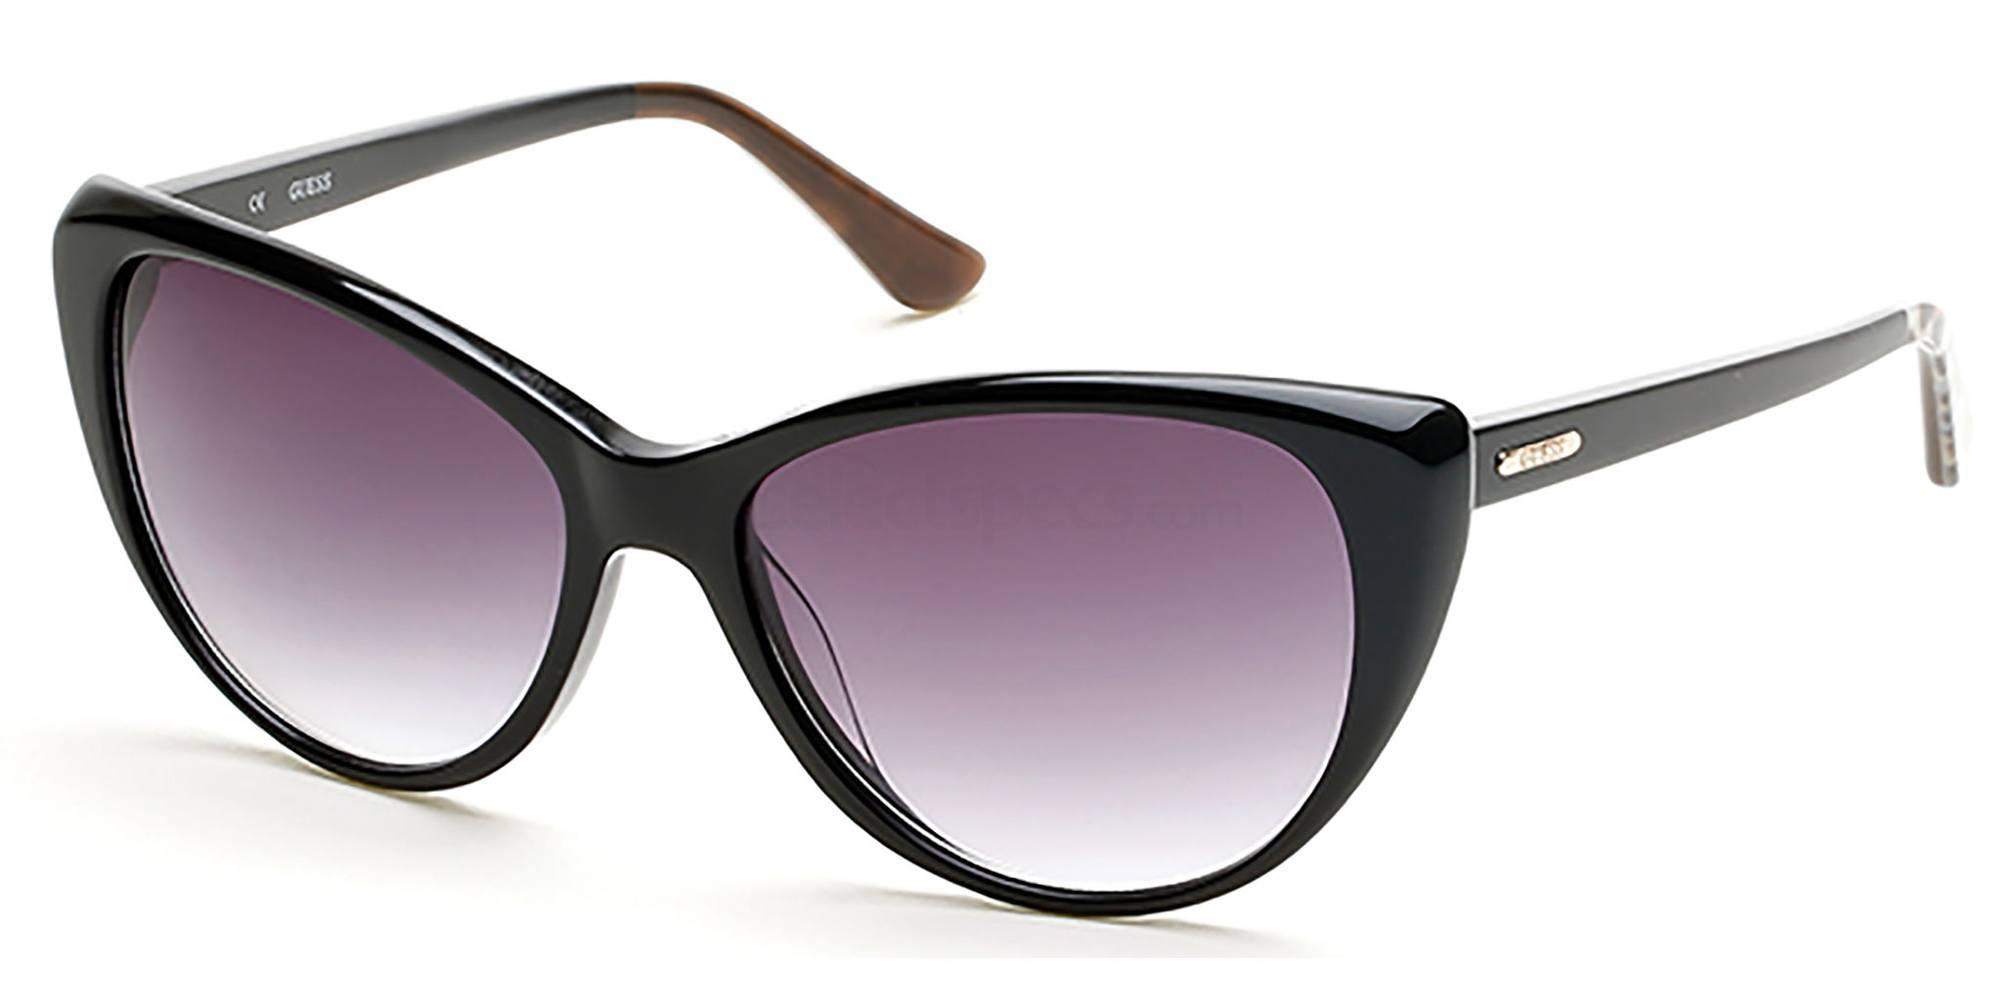 01B GU7427 Sunglasses, Guess